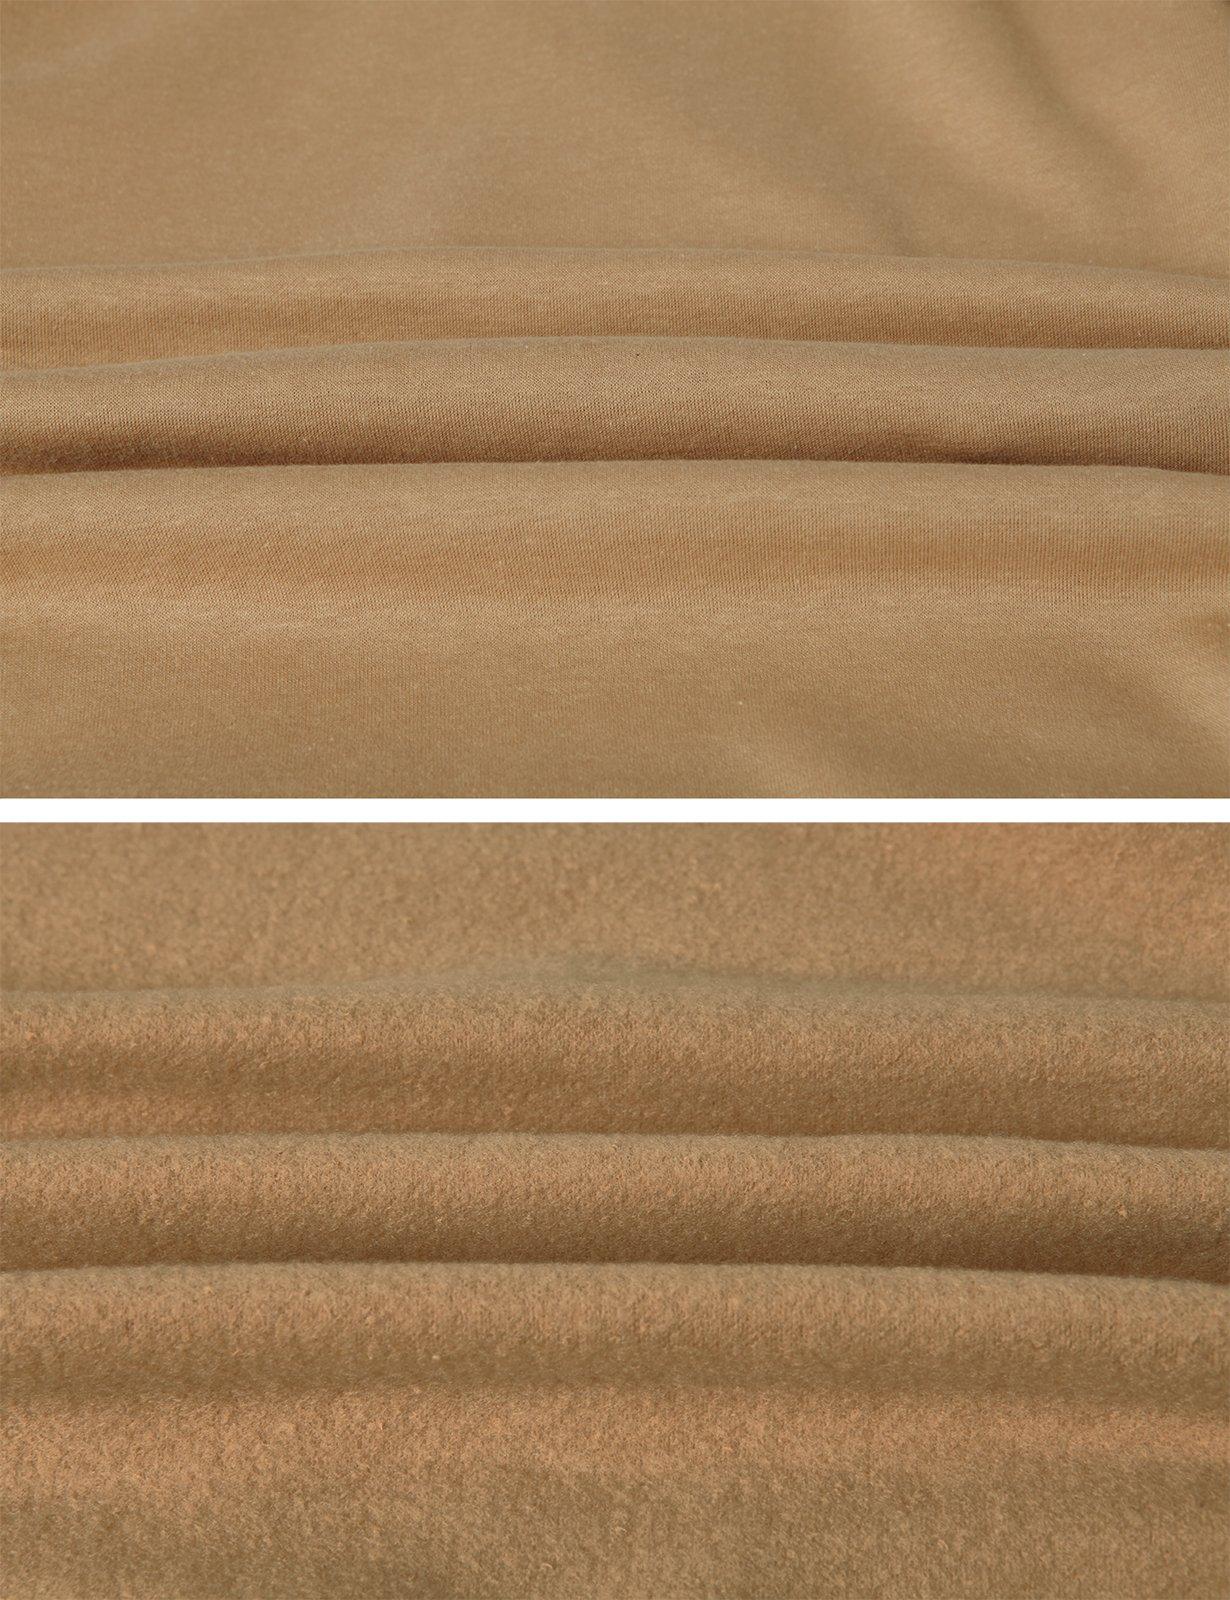 H2H Men's Fine Quality Plush Fleece Lined Pullover Beige US L/Asia XL (KMOHOL0126) by H2H (Image #5)